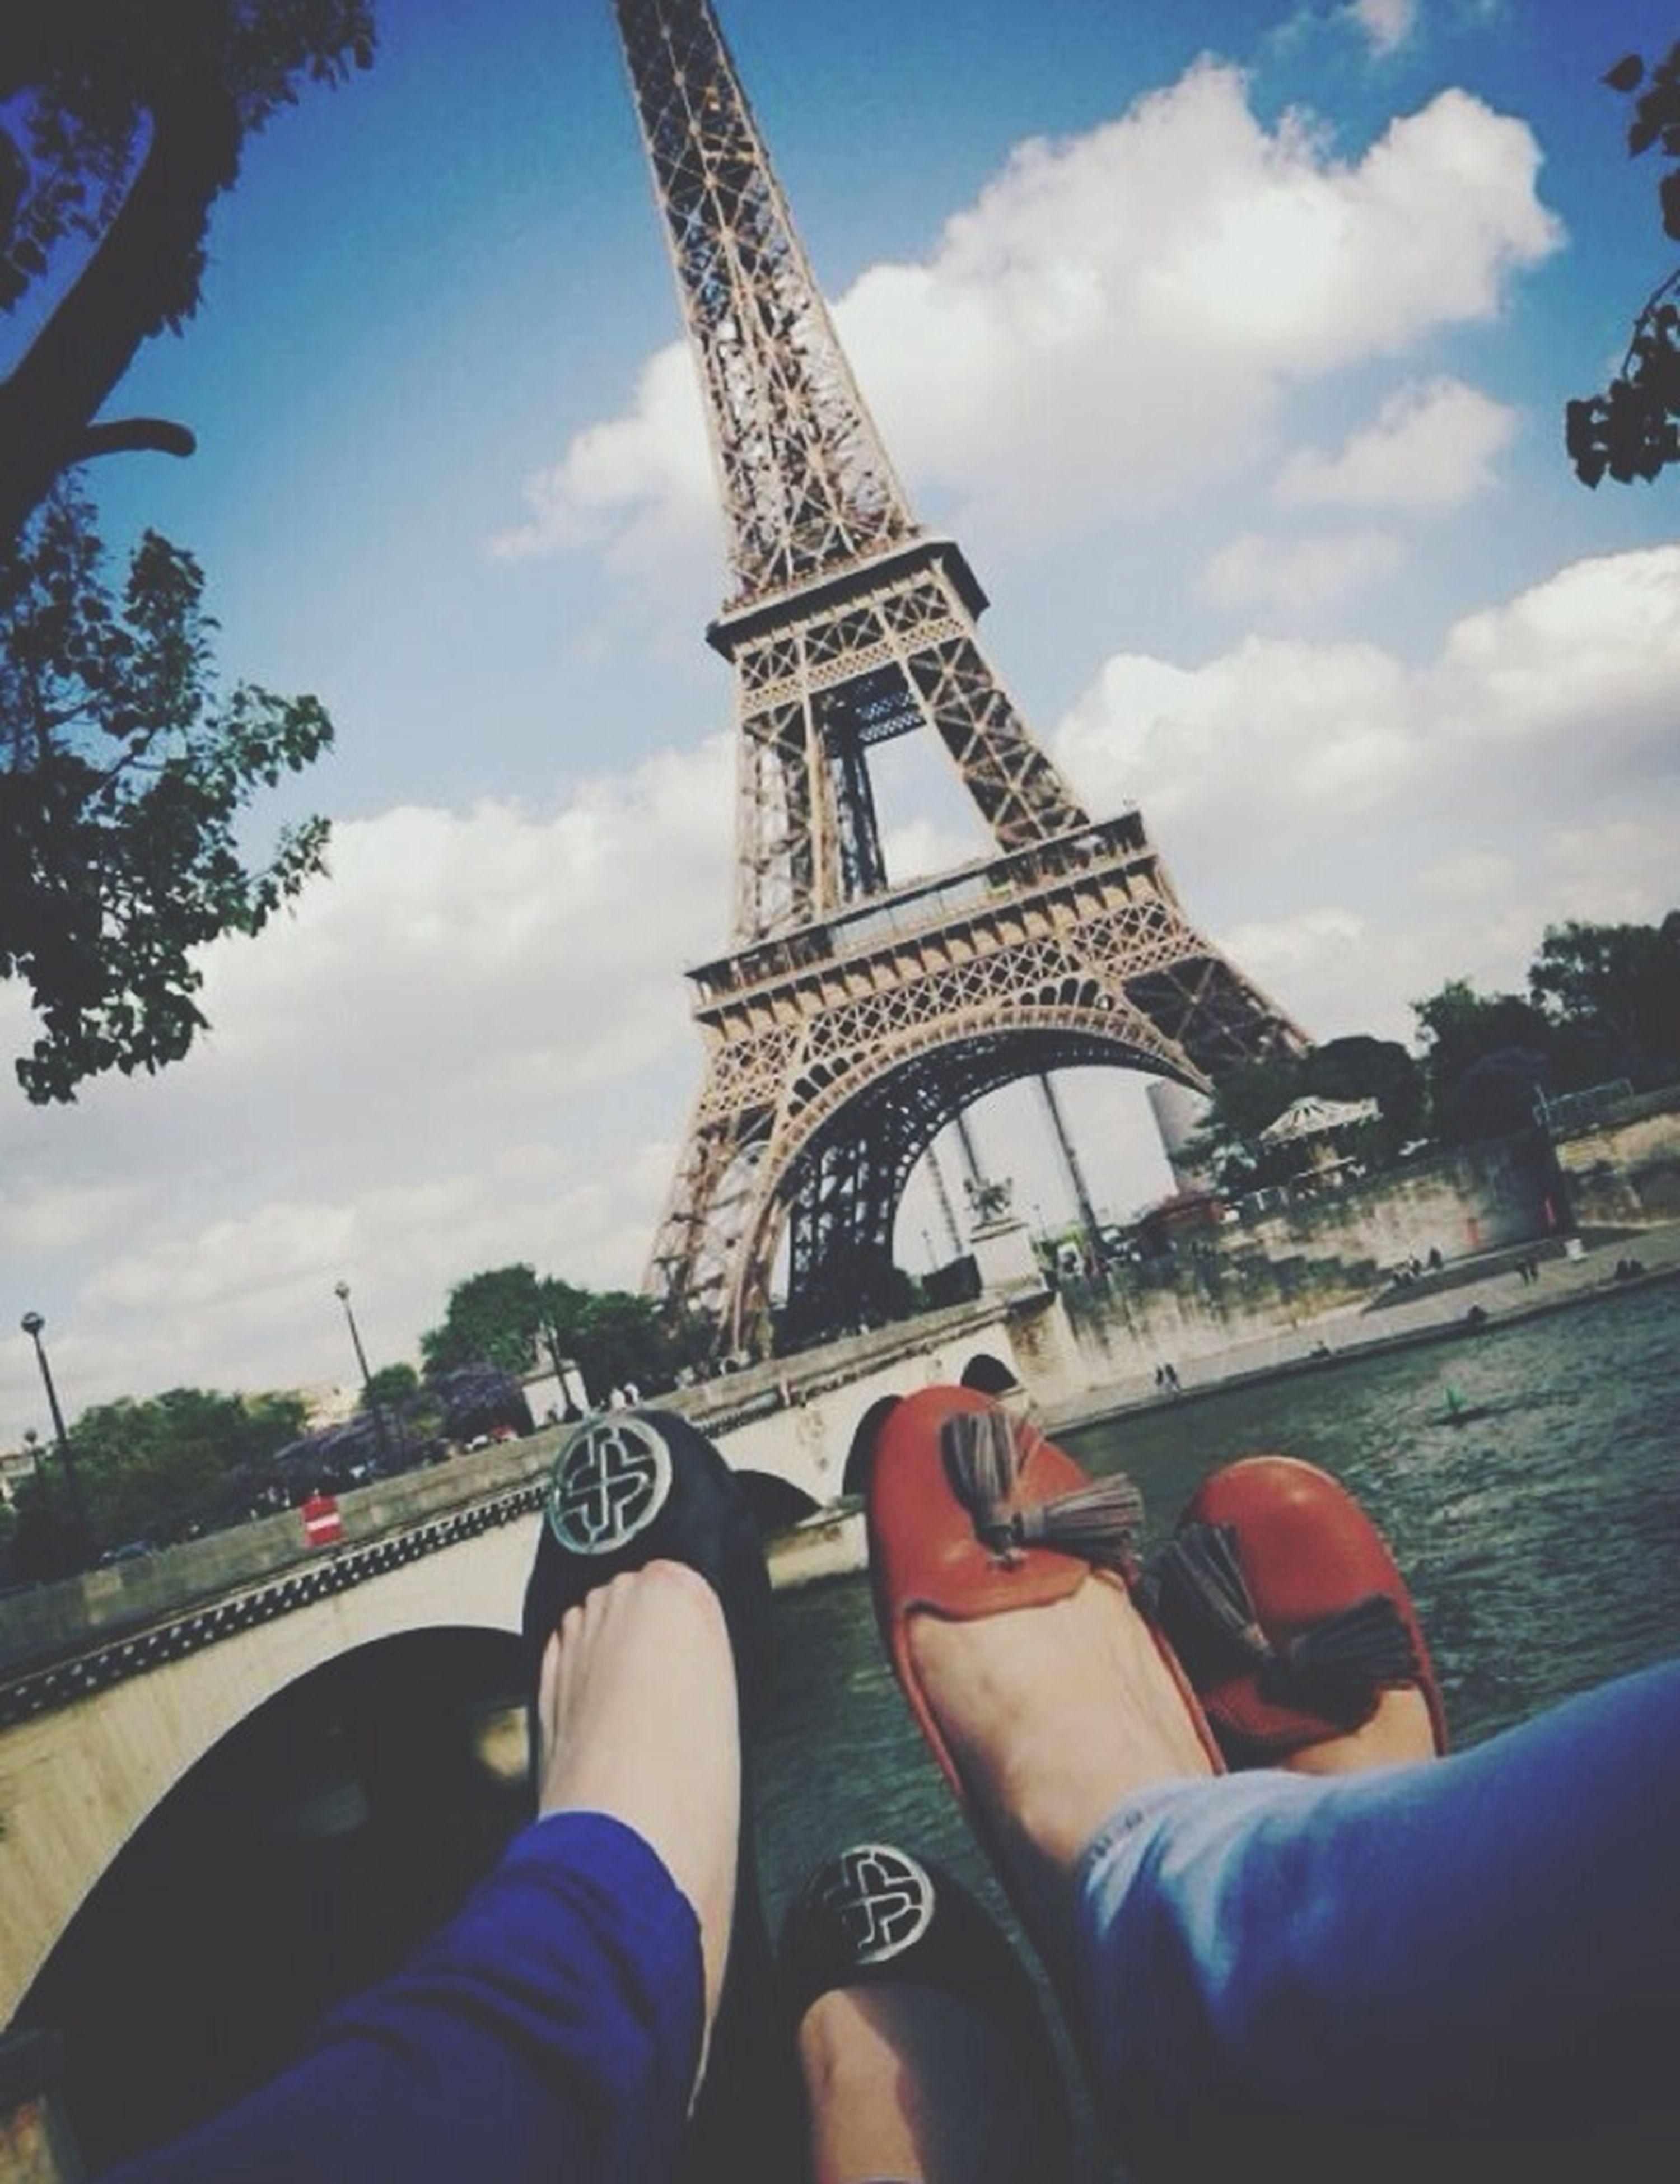 architecture, built structure, lifestyles, sky, tower, international landmark, famous place, leisure activity, eiffel tower, tourism, travel destinations, men, travel, capital cities, personal perspective, tall - high, city, building exterior